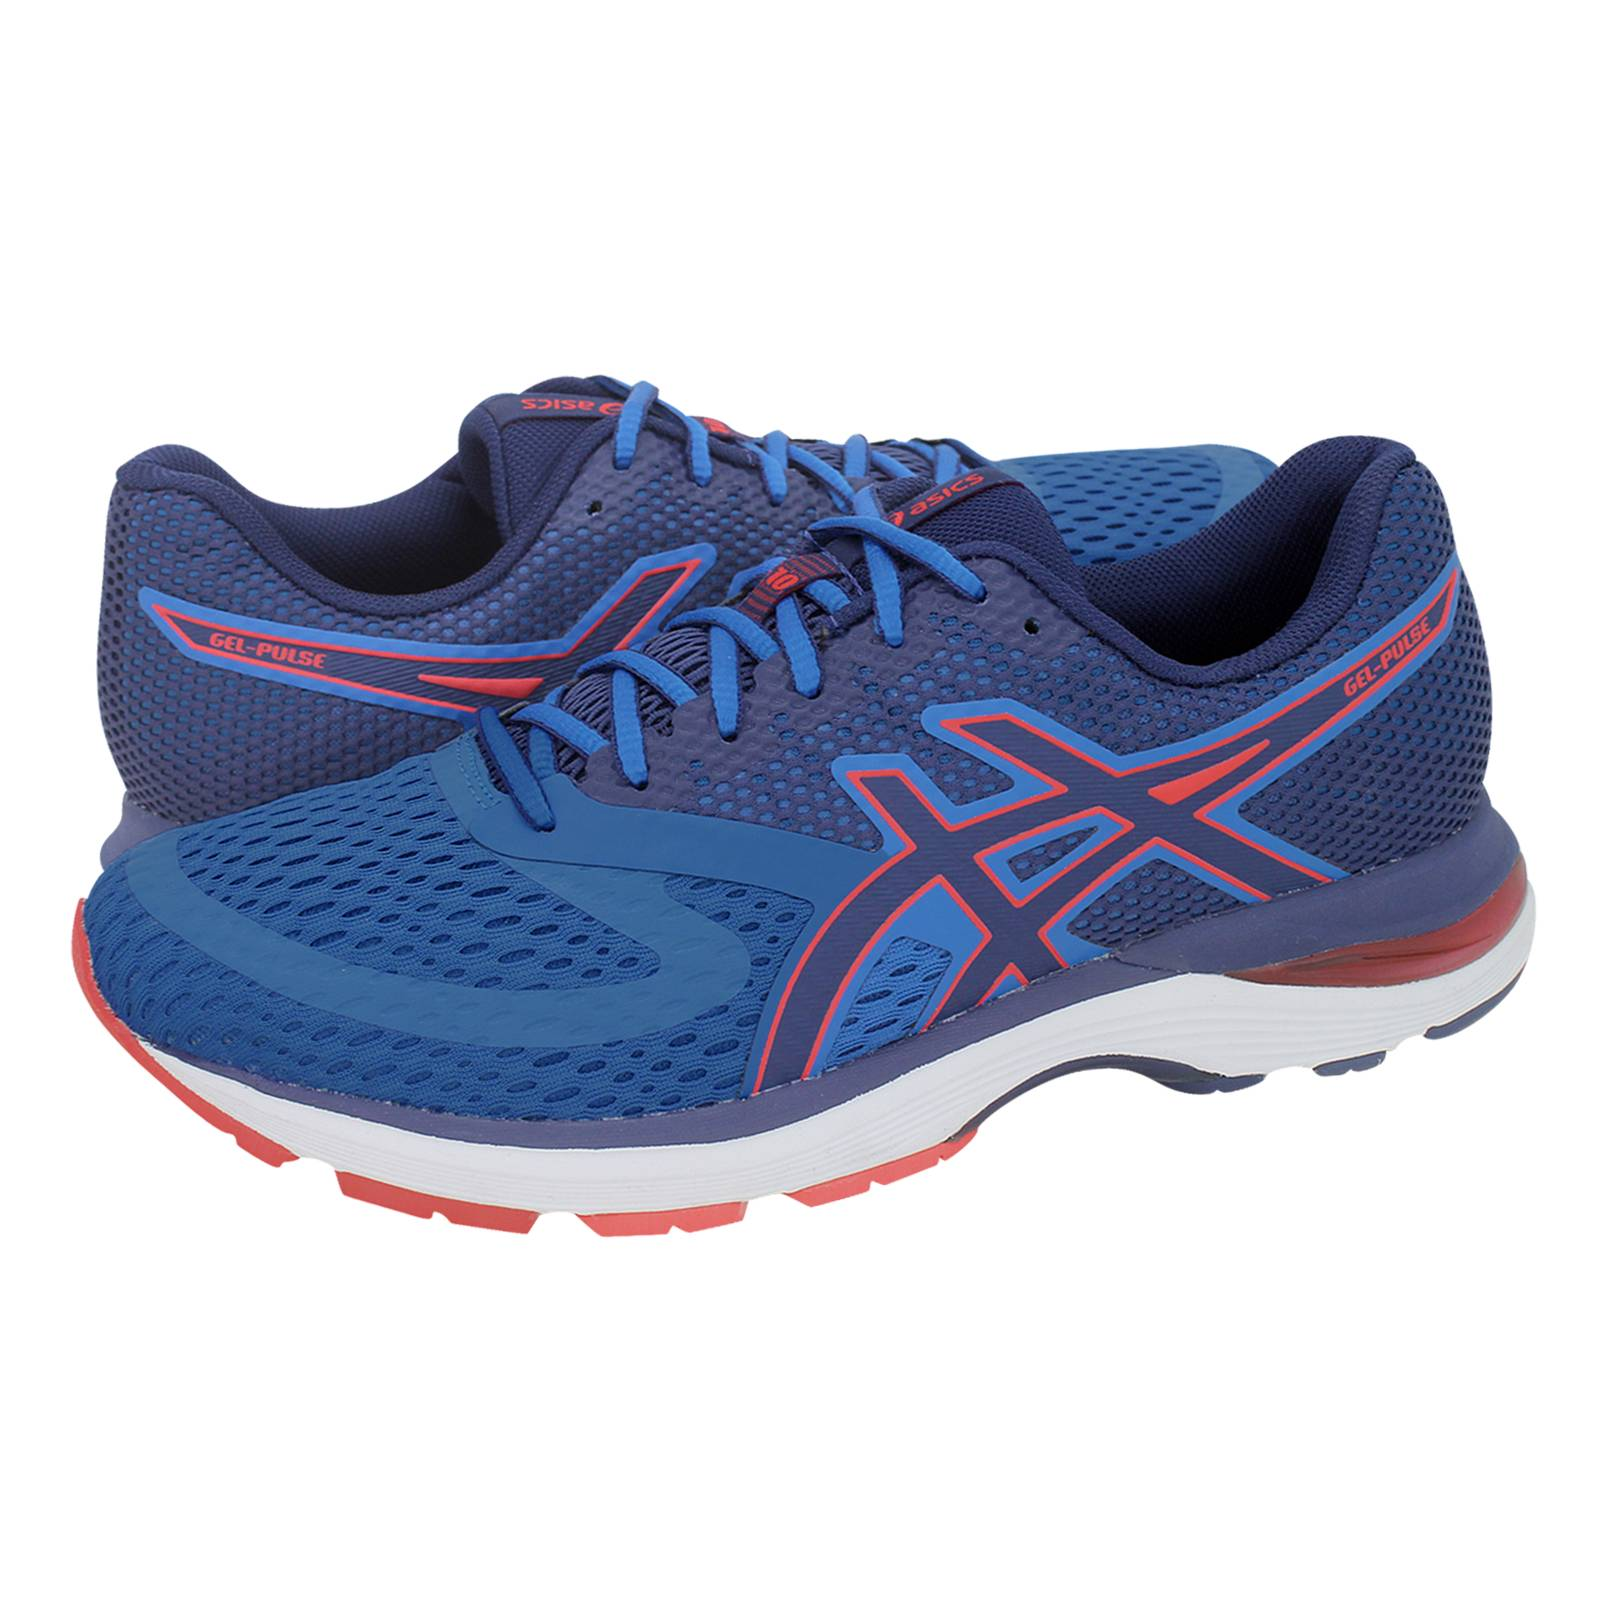 b3443333e5d Gel-Pulse 10 - Ανδρικά αθλητικά παπούτσια Asics από υφασμα και ...